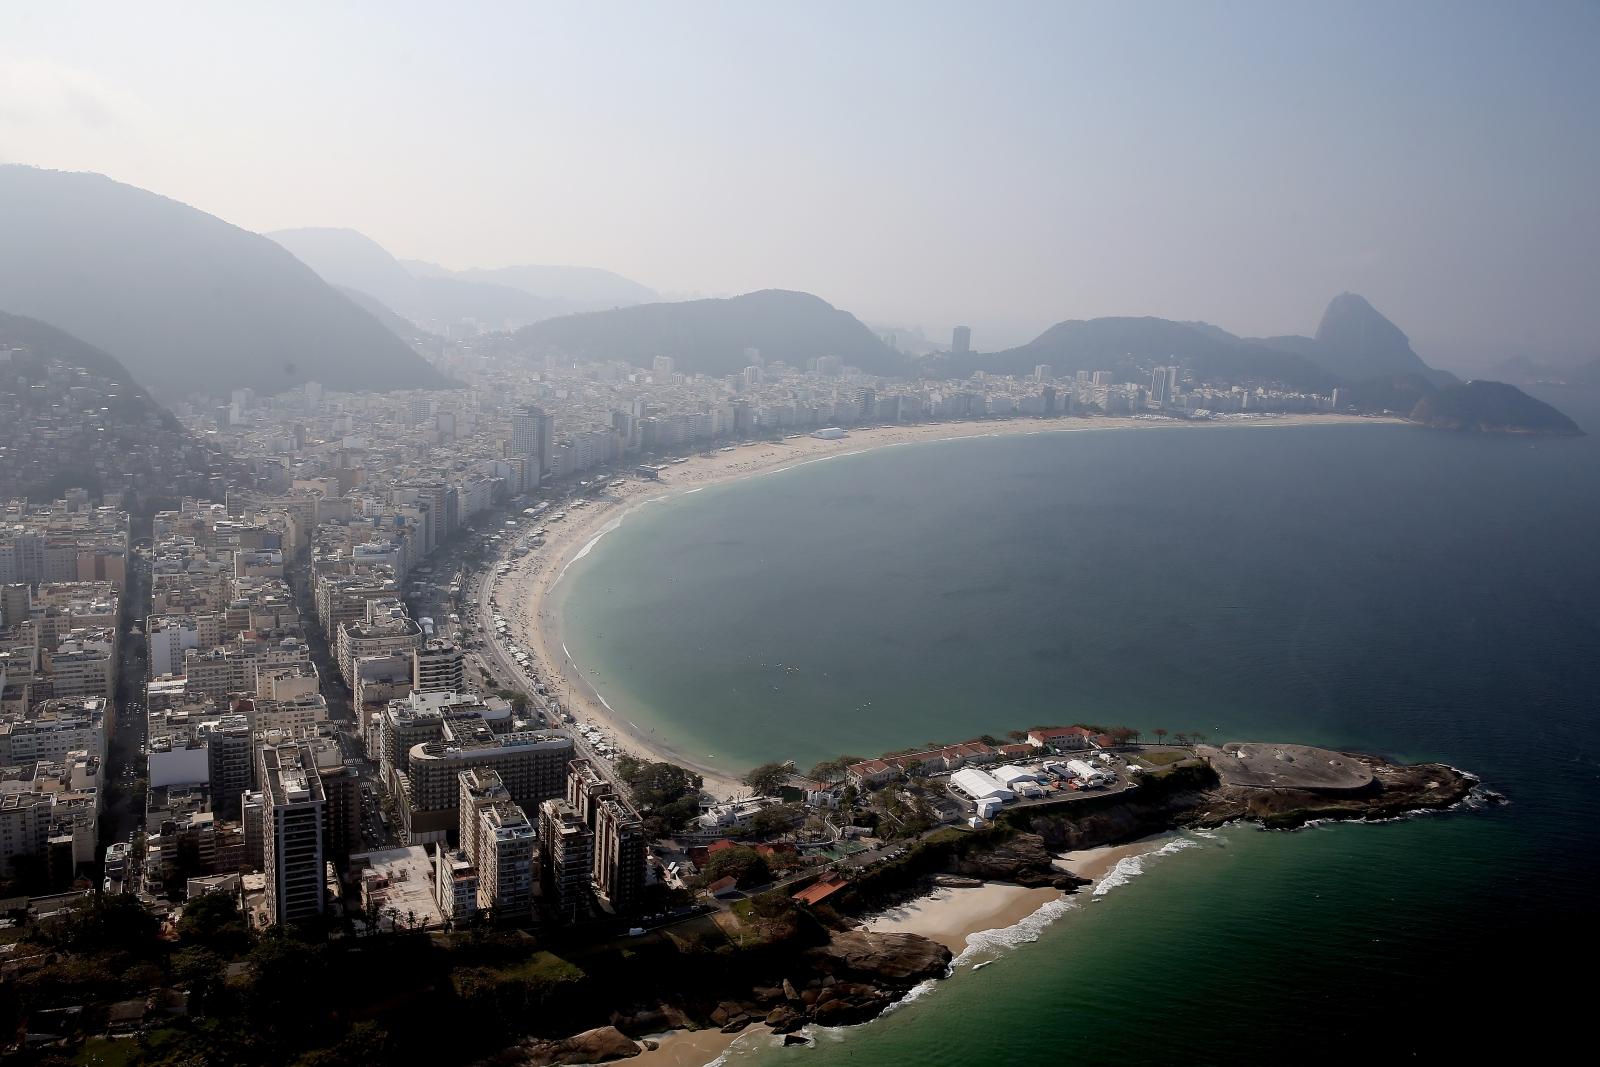 Rio 2016 Olympics Schedule : Download Rio 2016 Schedule PDF